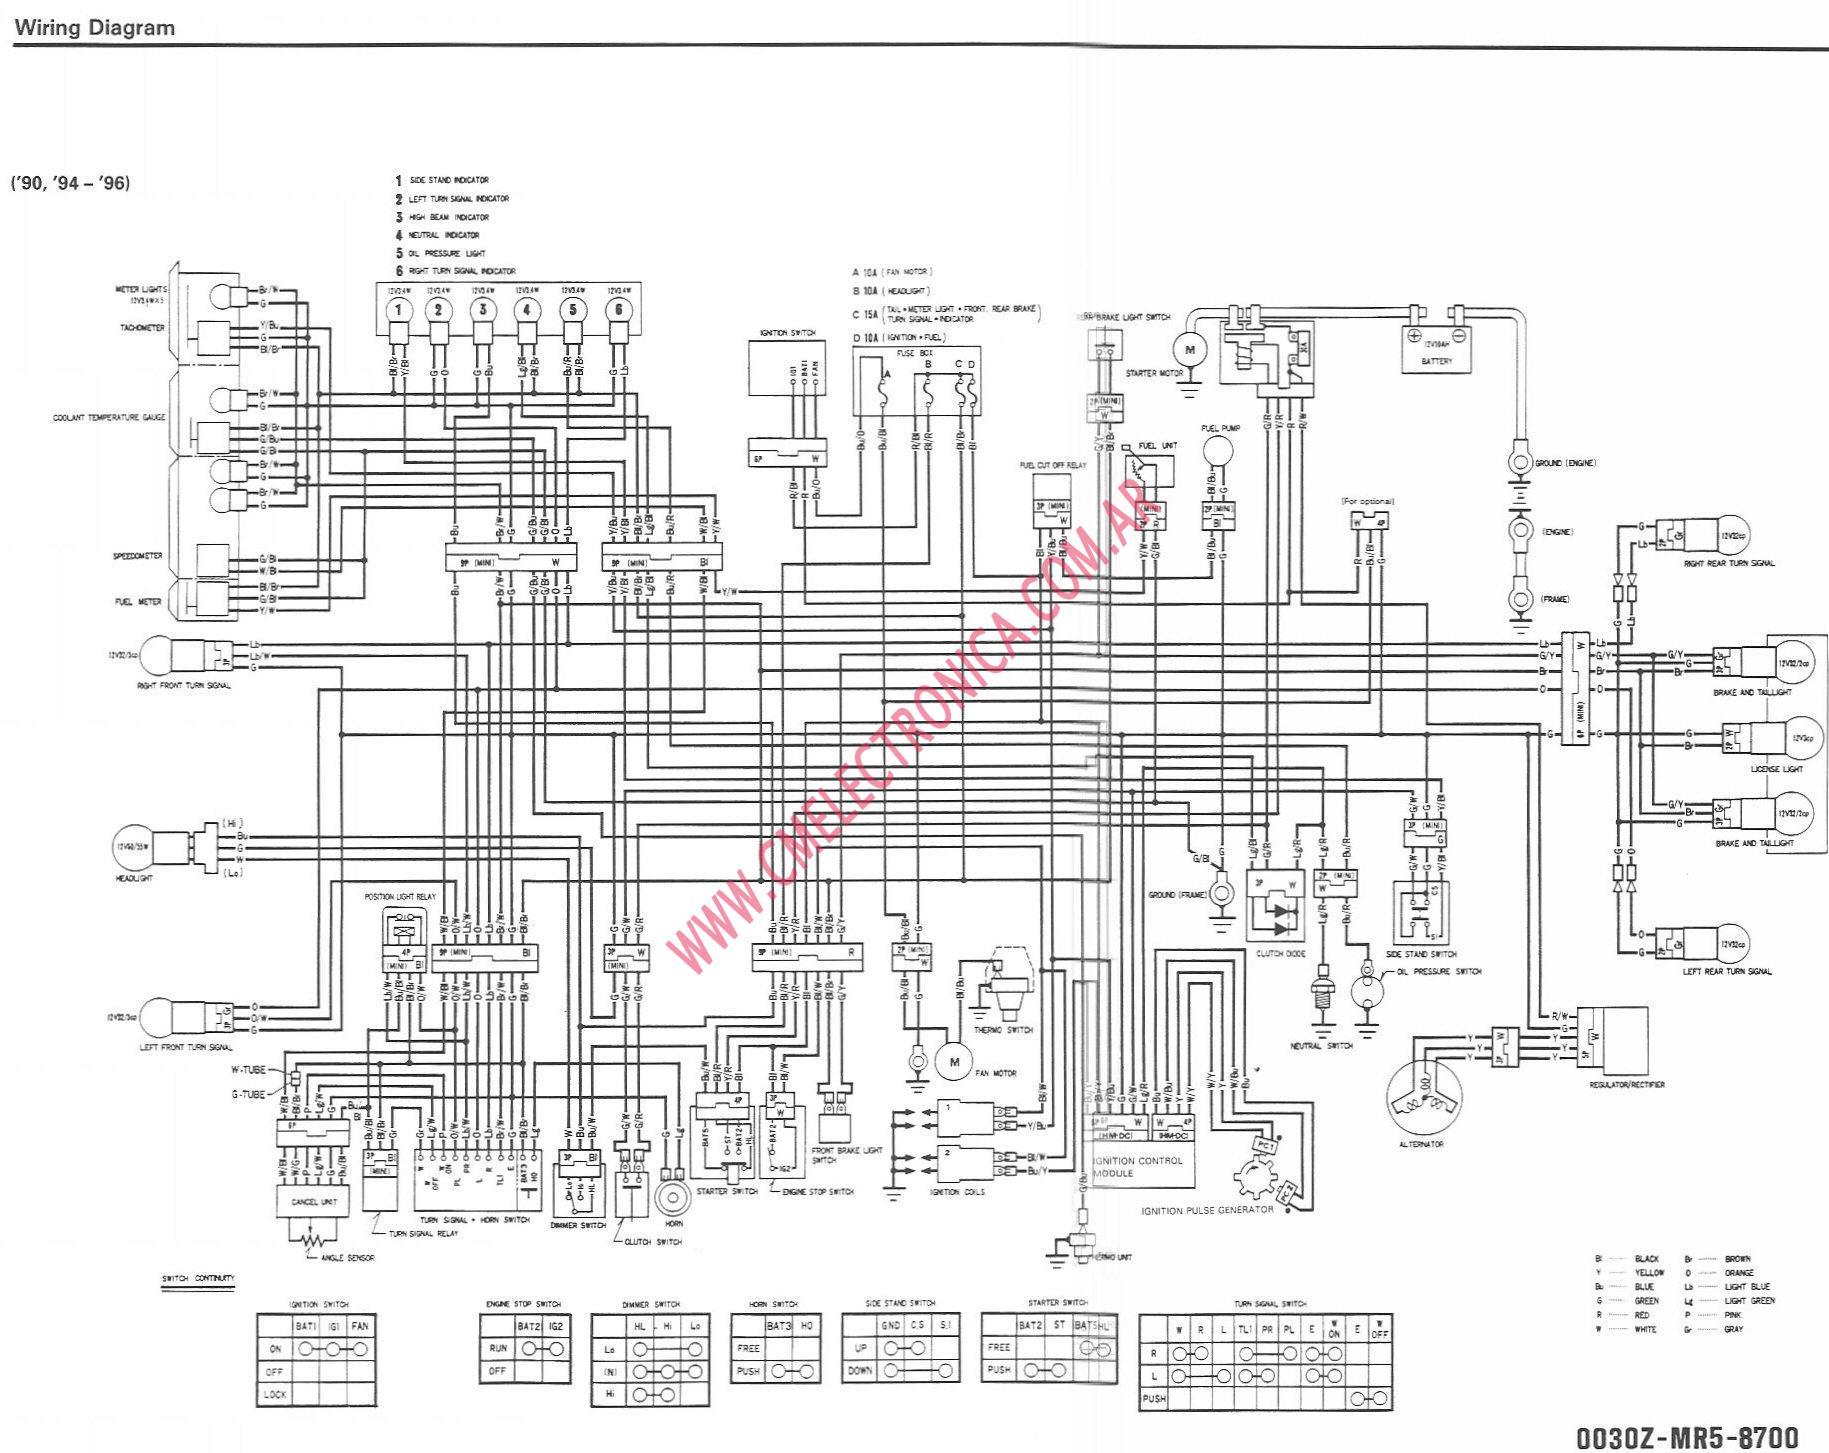 Cub Cadet Wiring Diagram Efi Trusted Schematics For Rzt 42 Lt1045